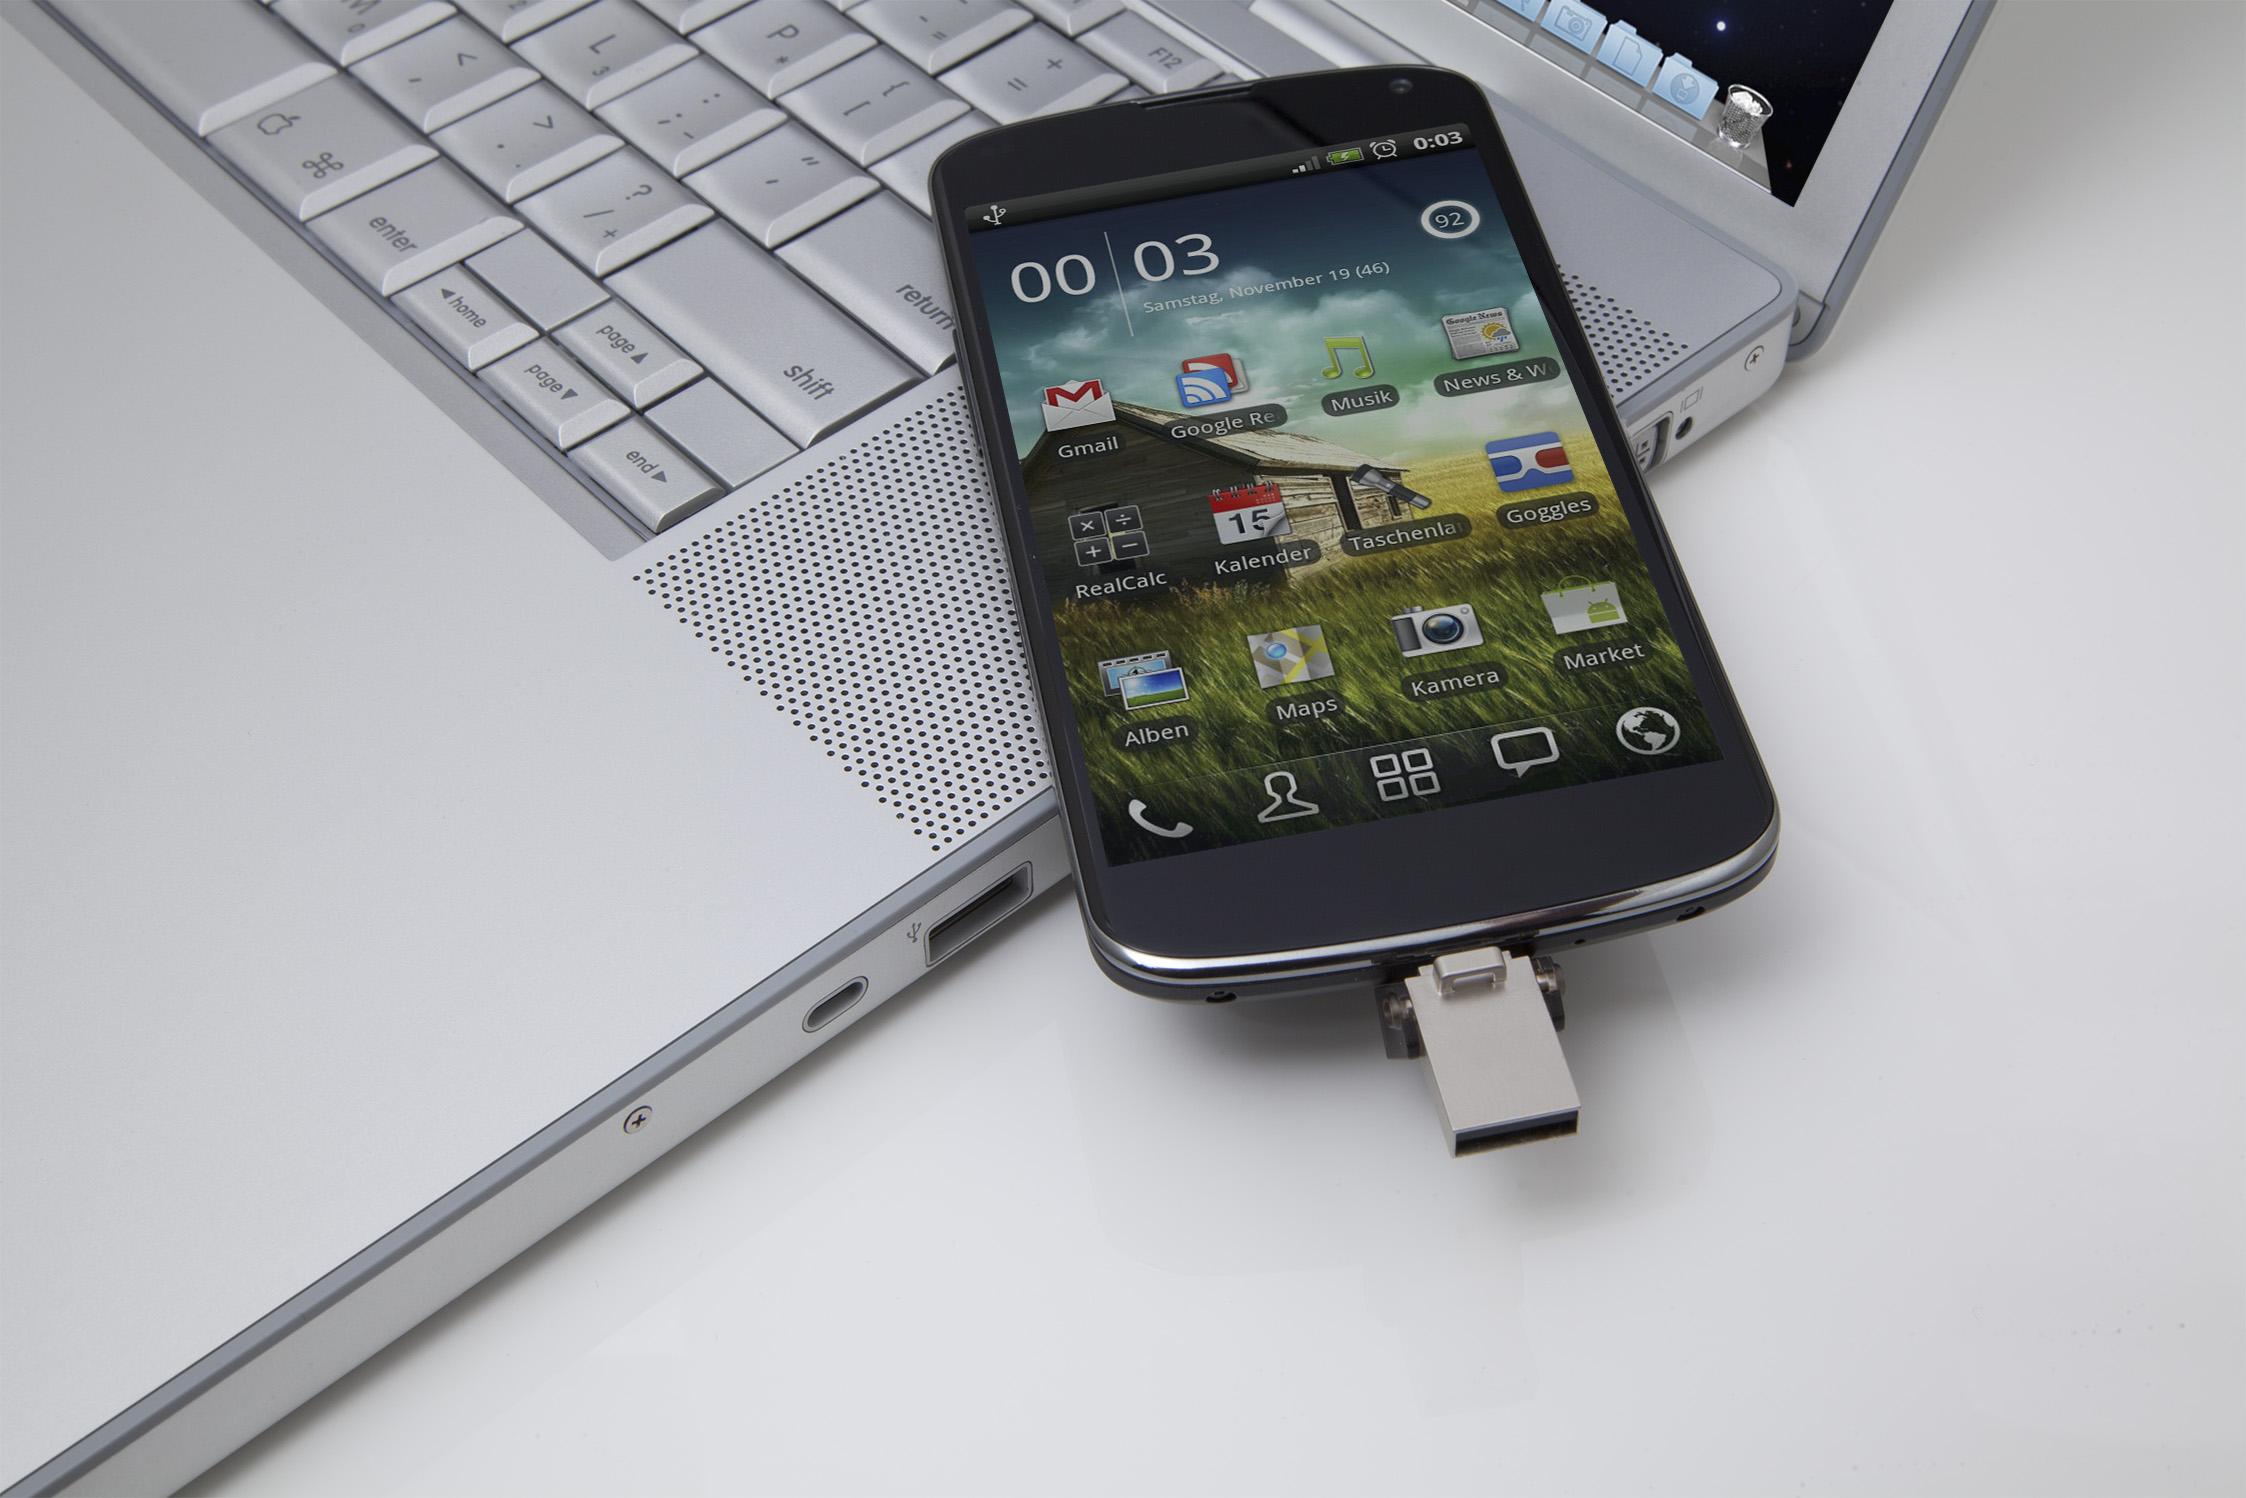 DataTraveler microDuo Usage Image_DTDUO-cellphone_laptop_28_02_2014 00_00